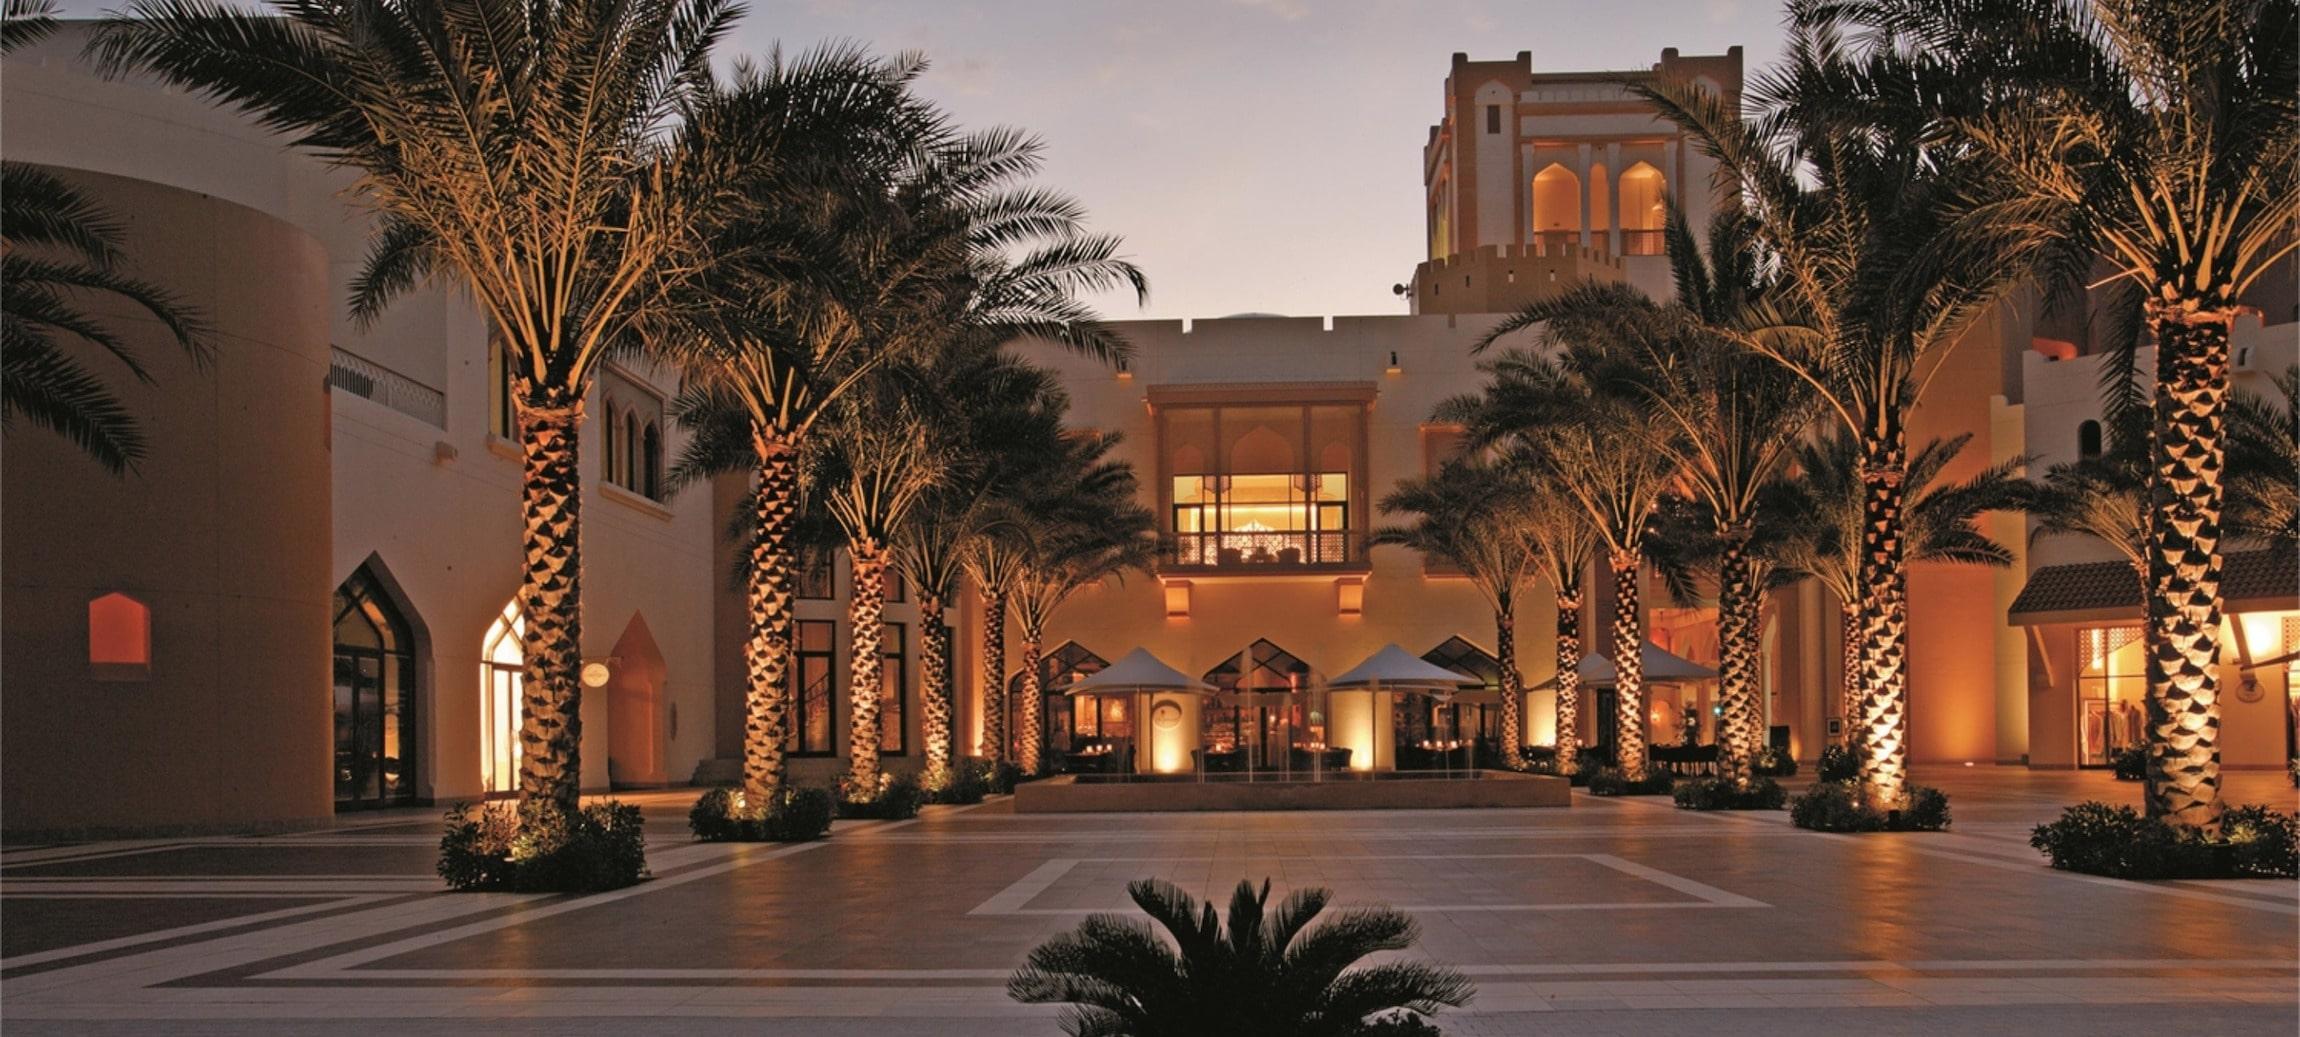 Entrée de l'hôtel Barr Al Jissah.